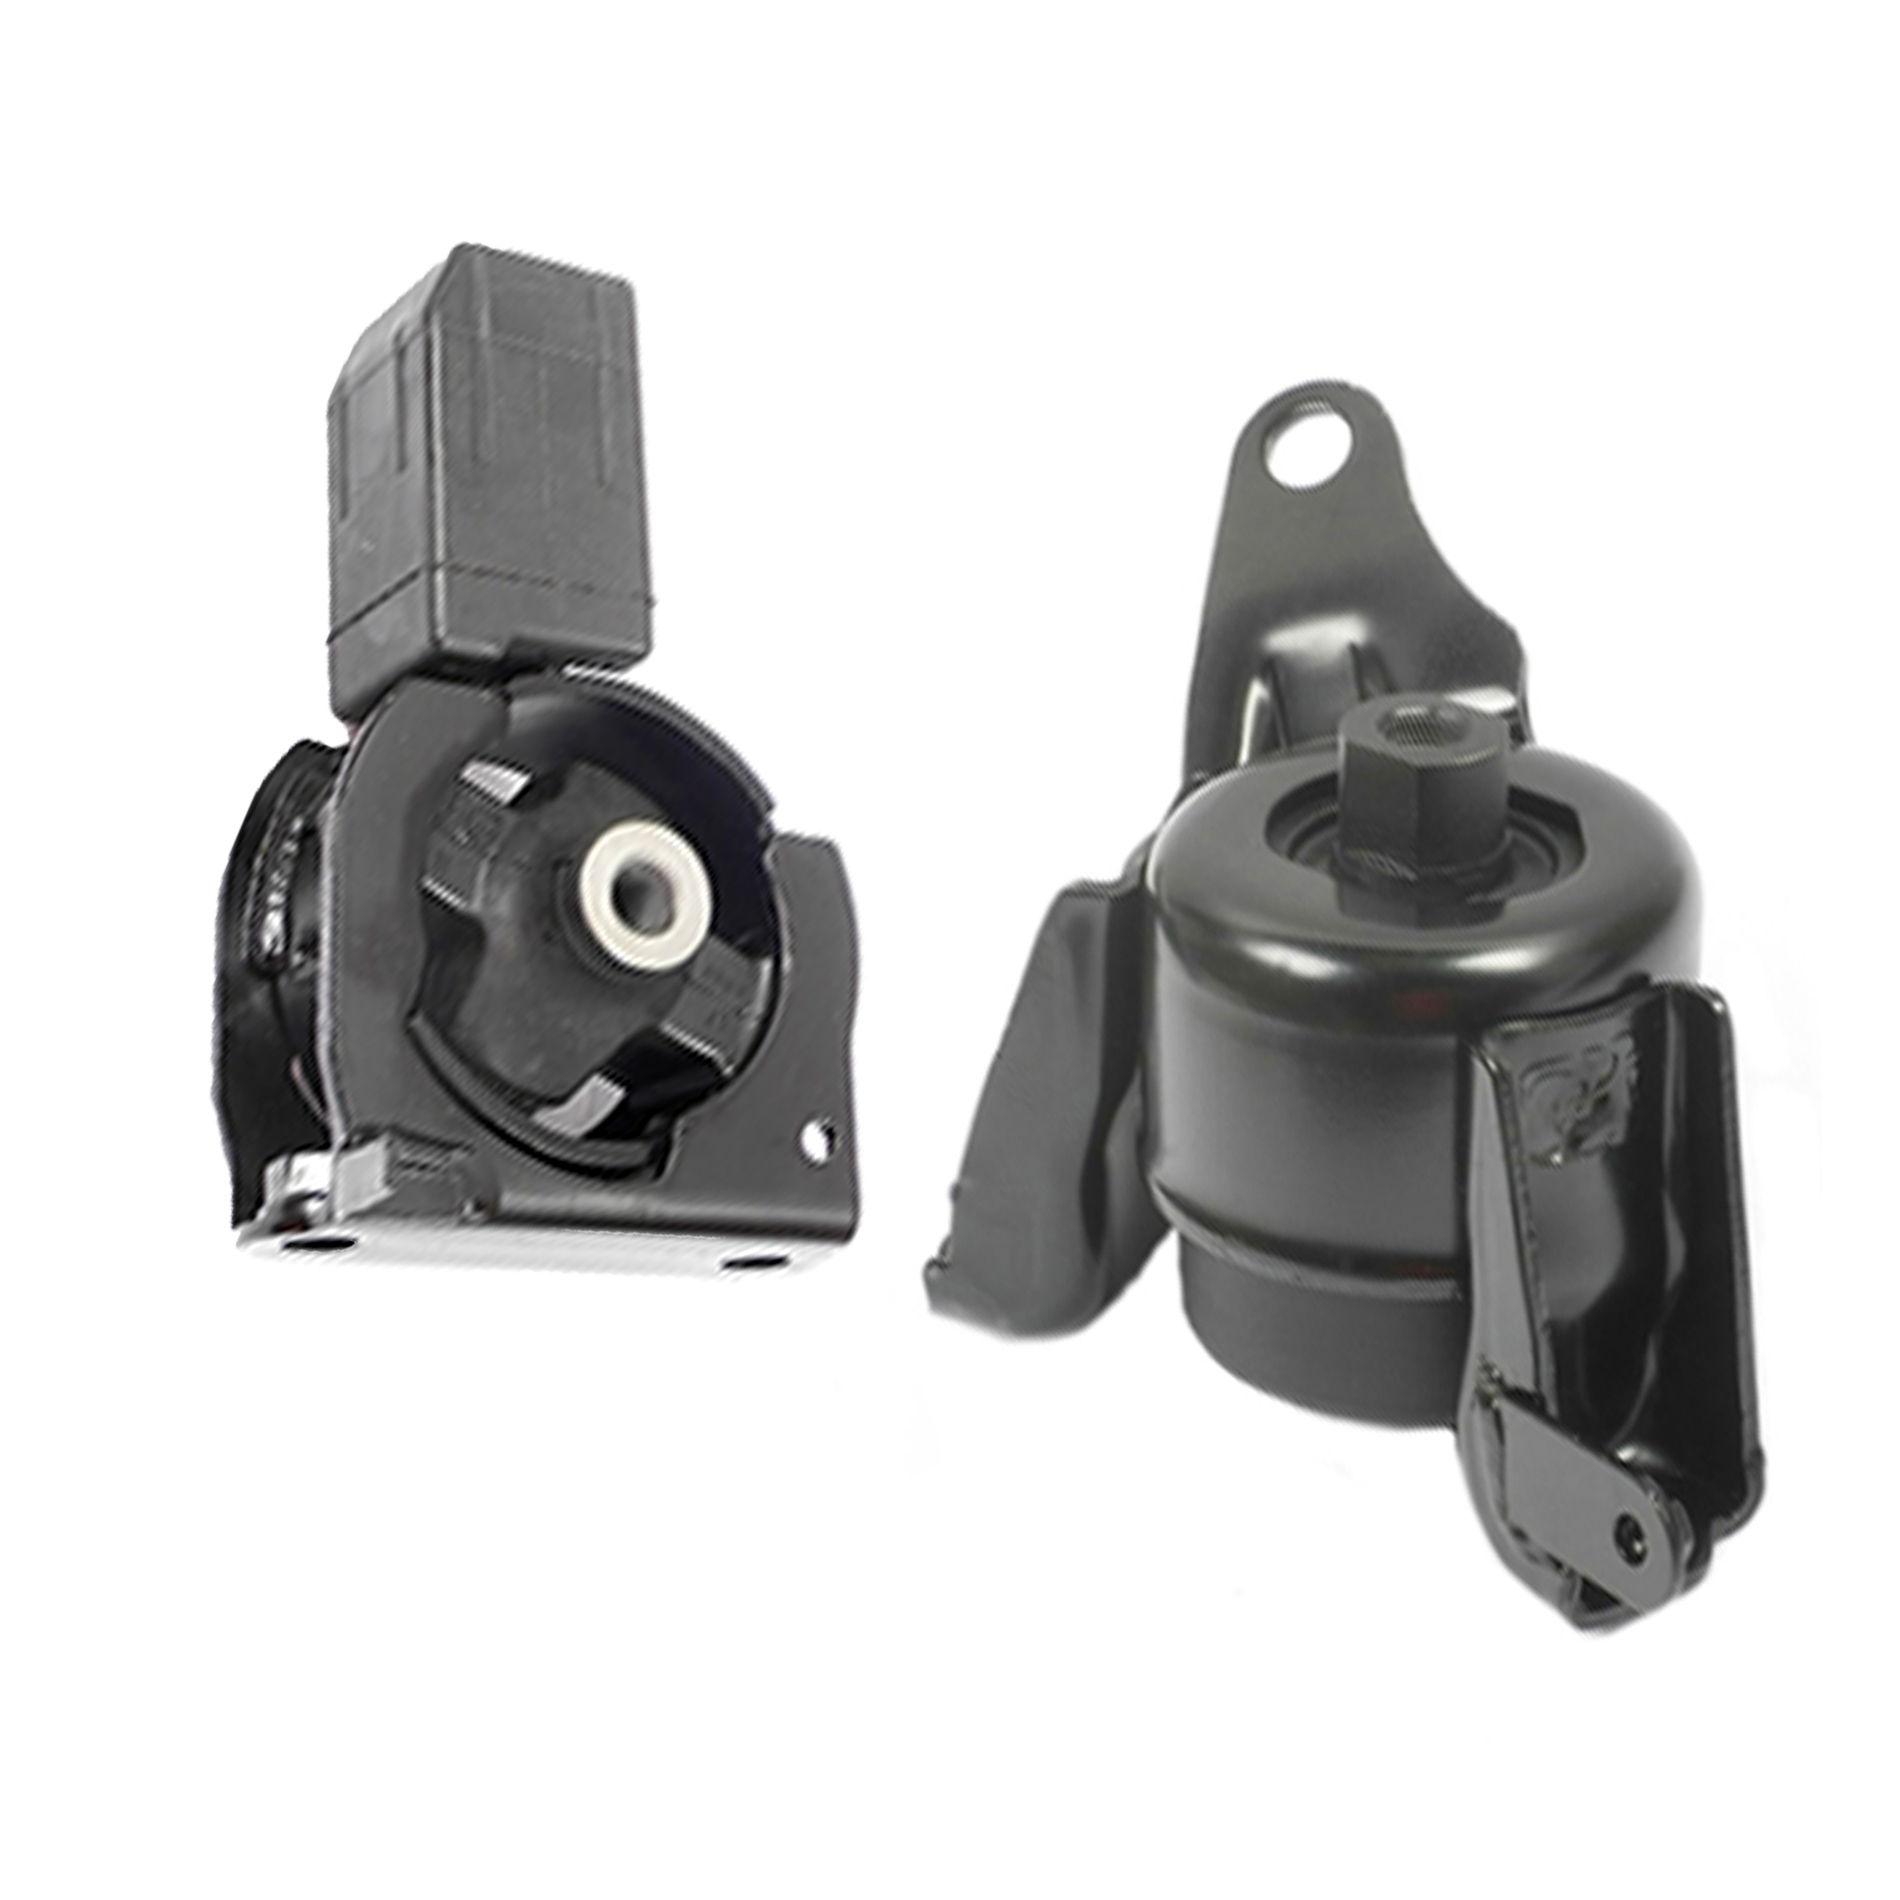 2005-2010 For Scion tC 2.4L Engine Motor Mount Set 2PCS 62033 62037HY M944 New